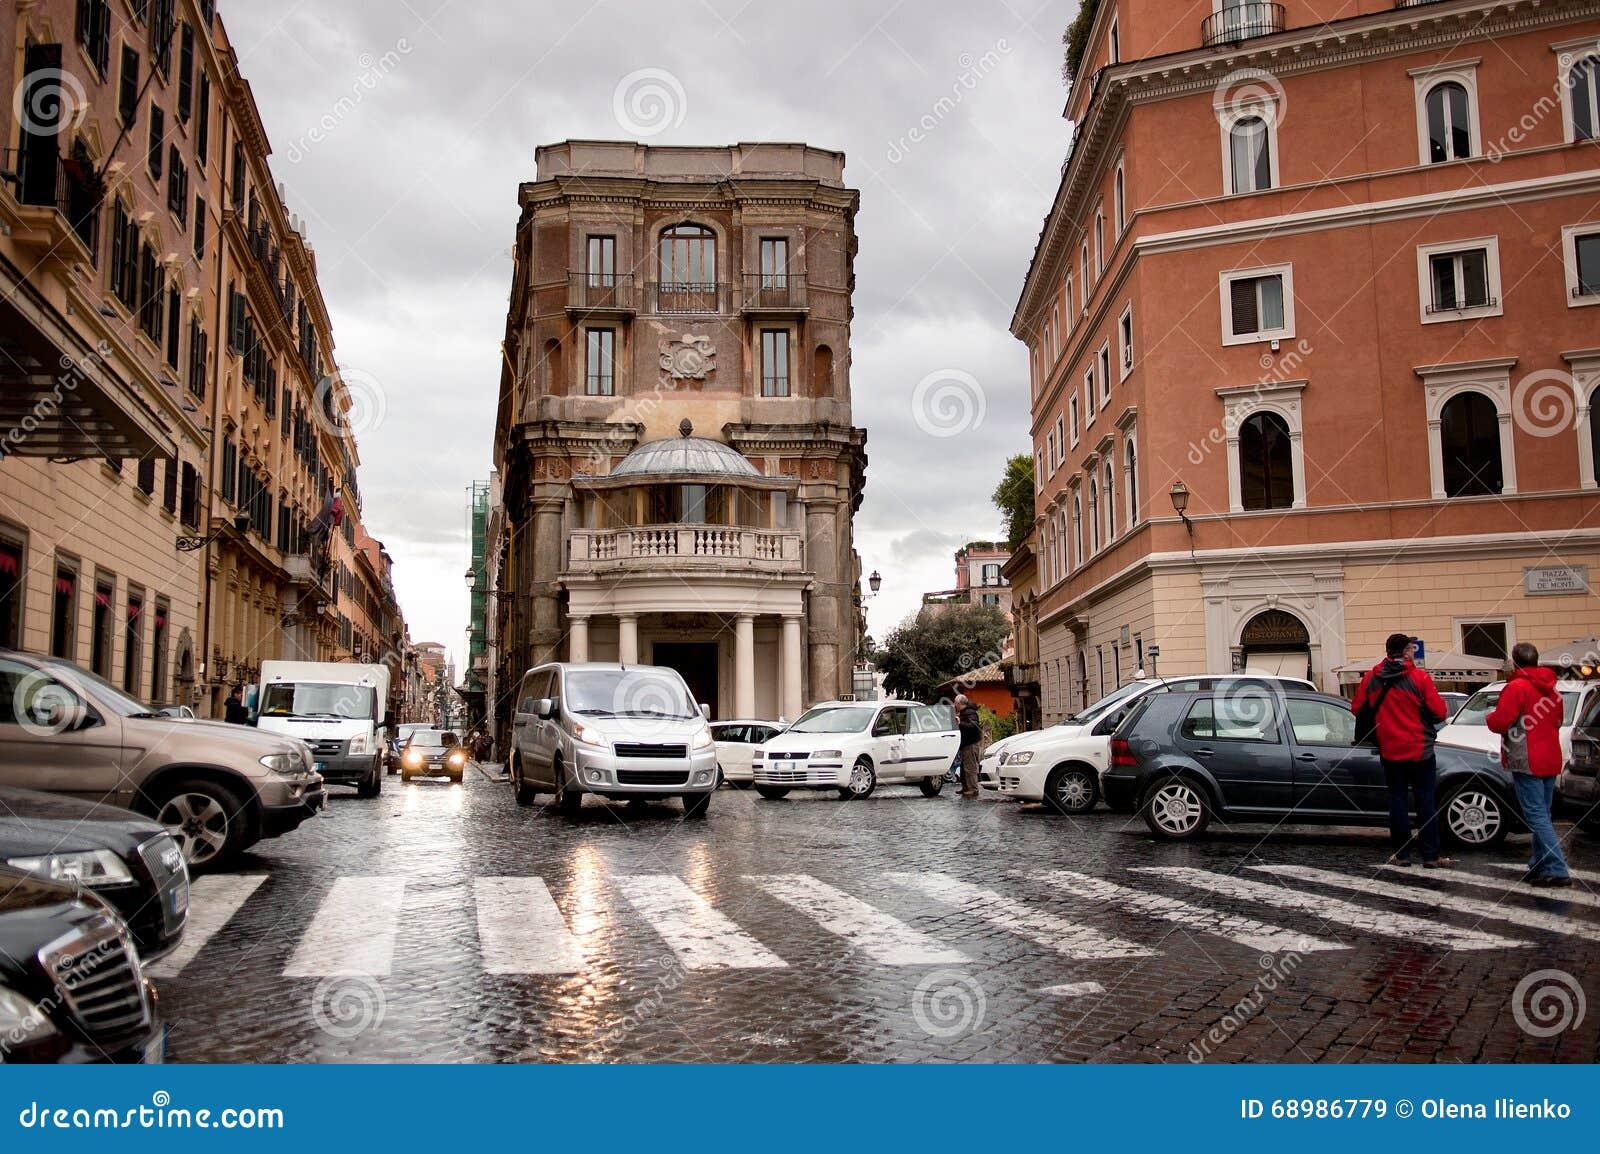 Coches en la calle en Roma, Italia